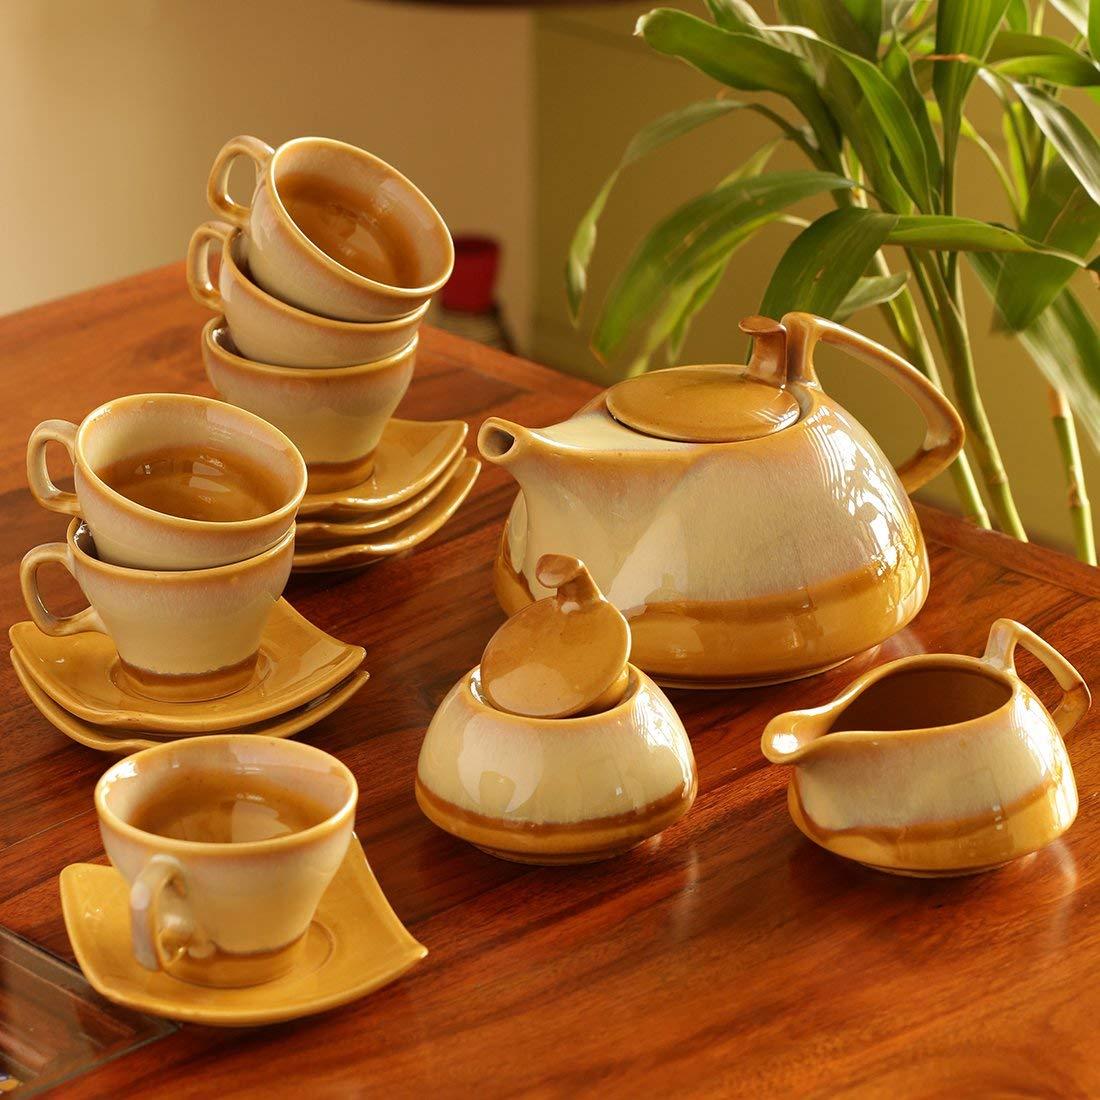 ExclusiveLane Tea Cups & Kettle Set Dual Glazed Studio Pottery In Ceramic (Set Of 15) - Cups Tea Cups Mugs Coffee Mugs Drinkware Sets Tea Cup Set Tea Sets Kettle Set Cups And Kettle Set